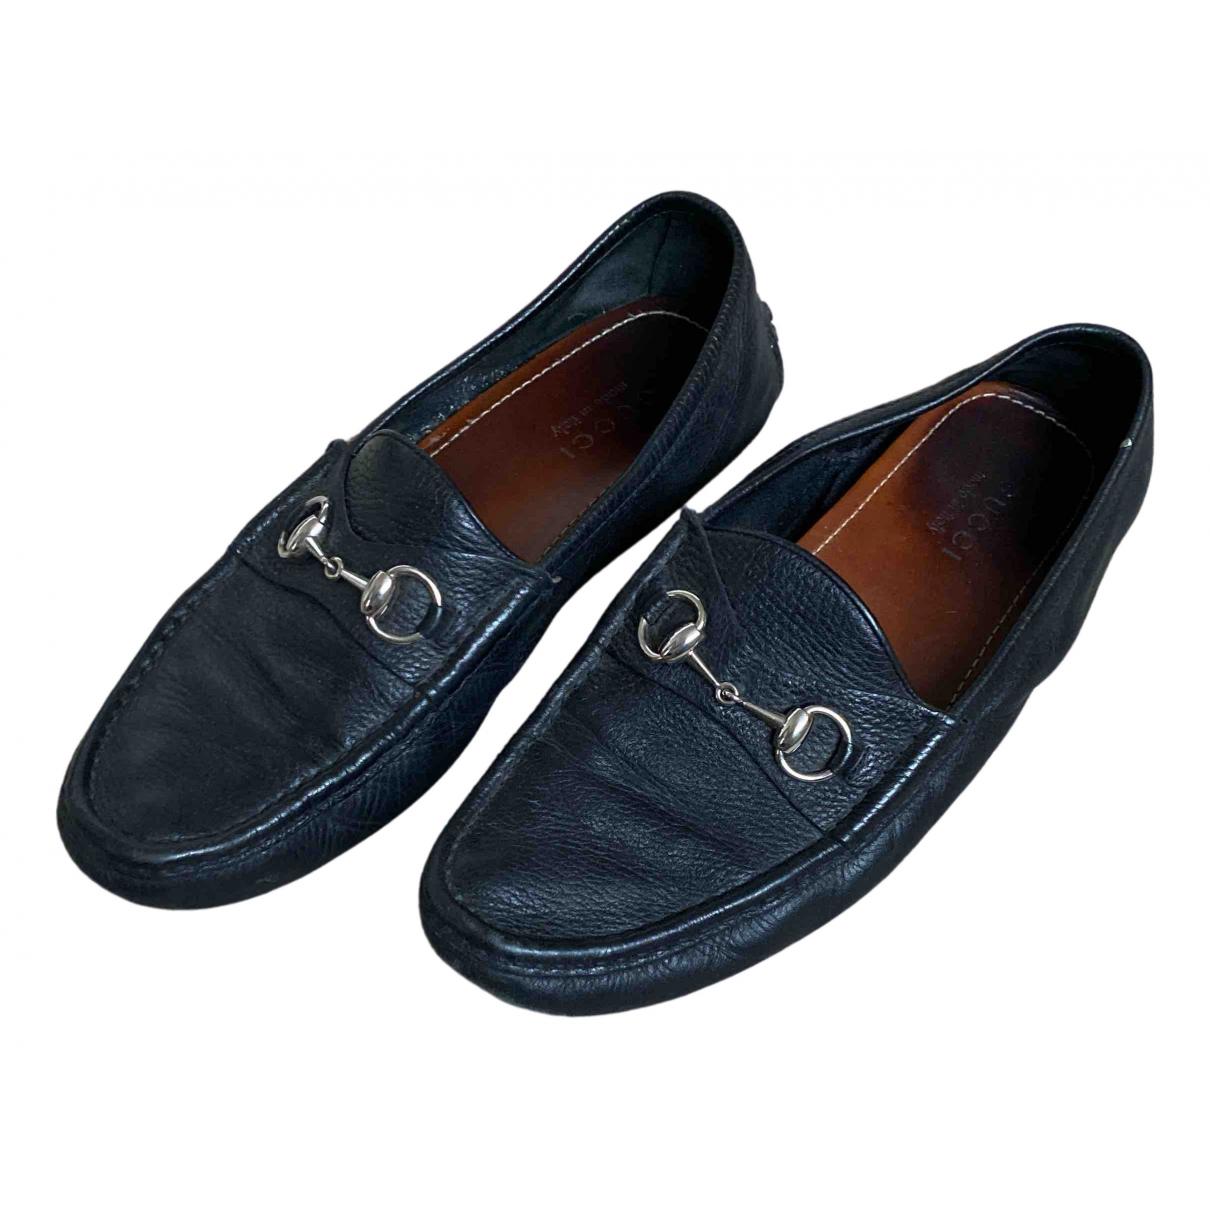 Gucci N Black Leather Flats for Men 8.5 UK